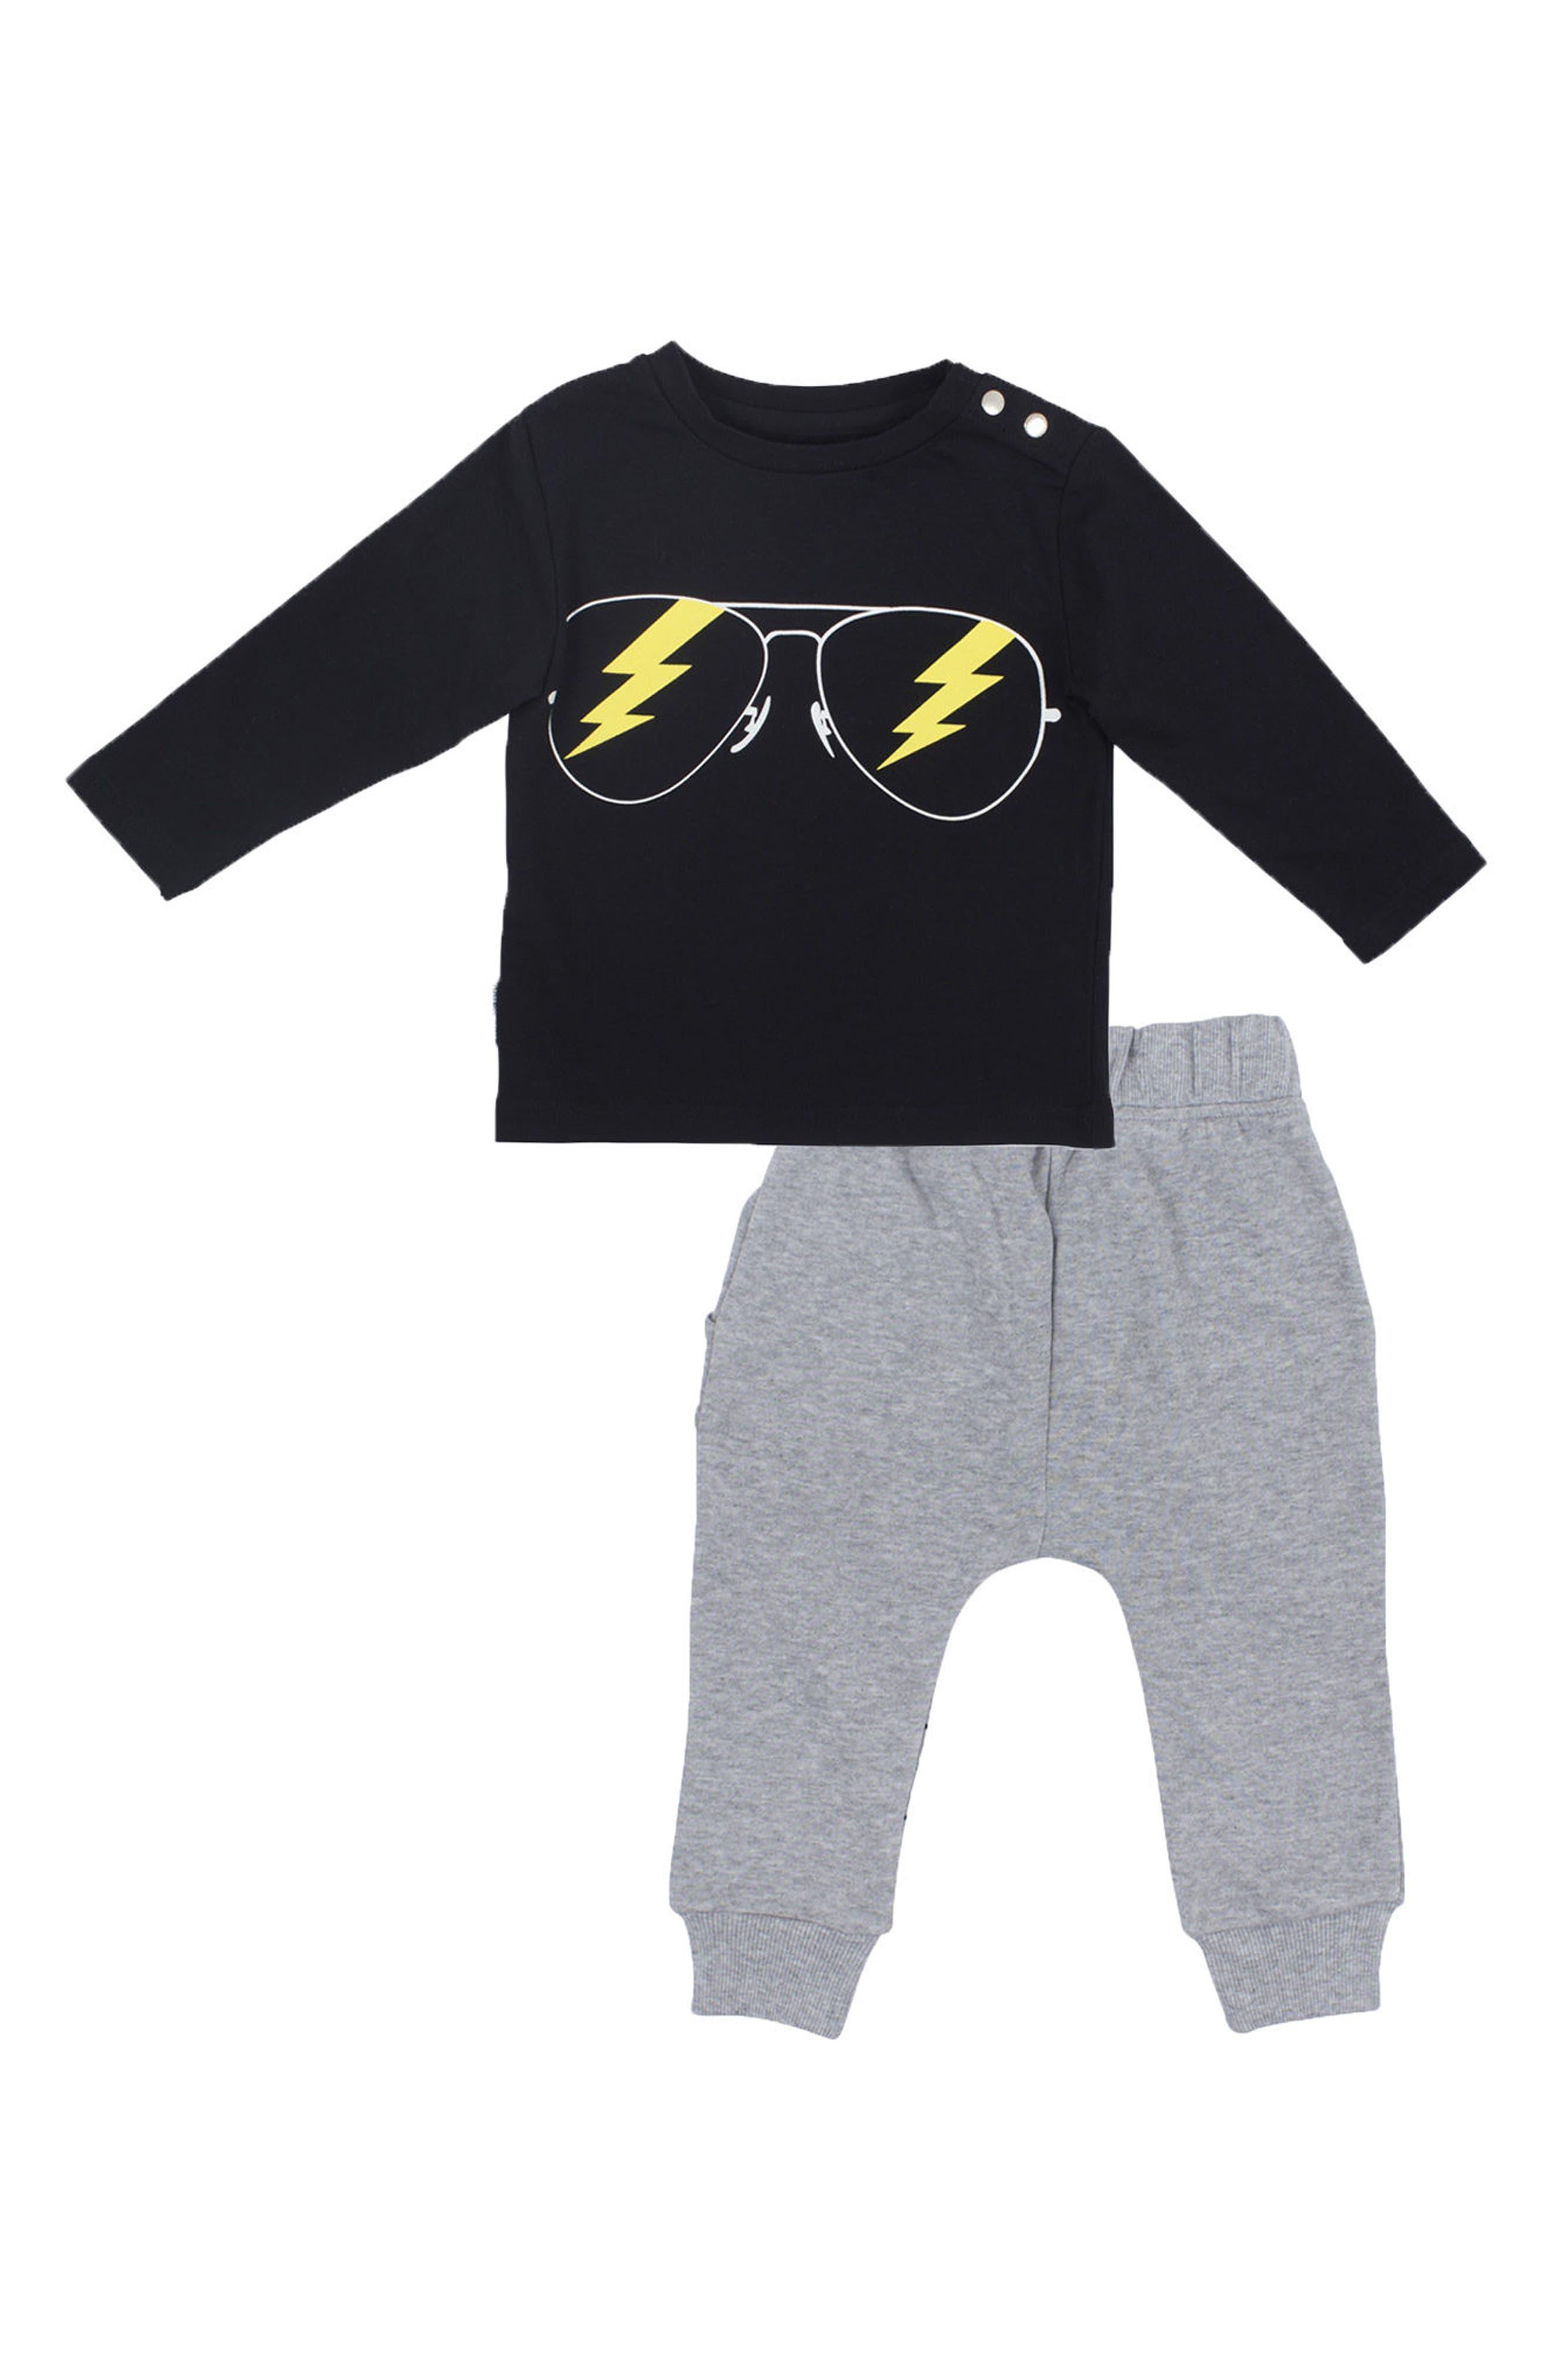 Alternate Image 1 Selected - Tiny Tribe Rockstar T-Shirt & Jogger Pants Set (Baby)